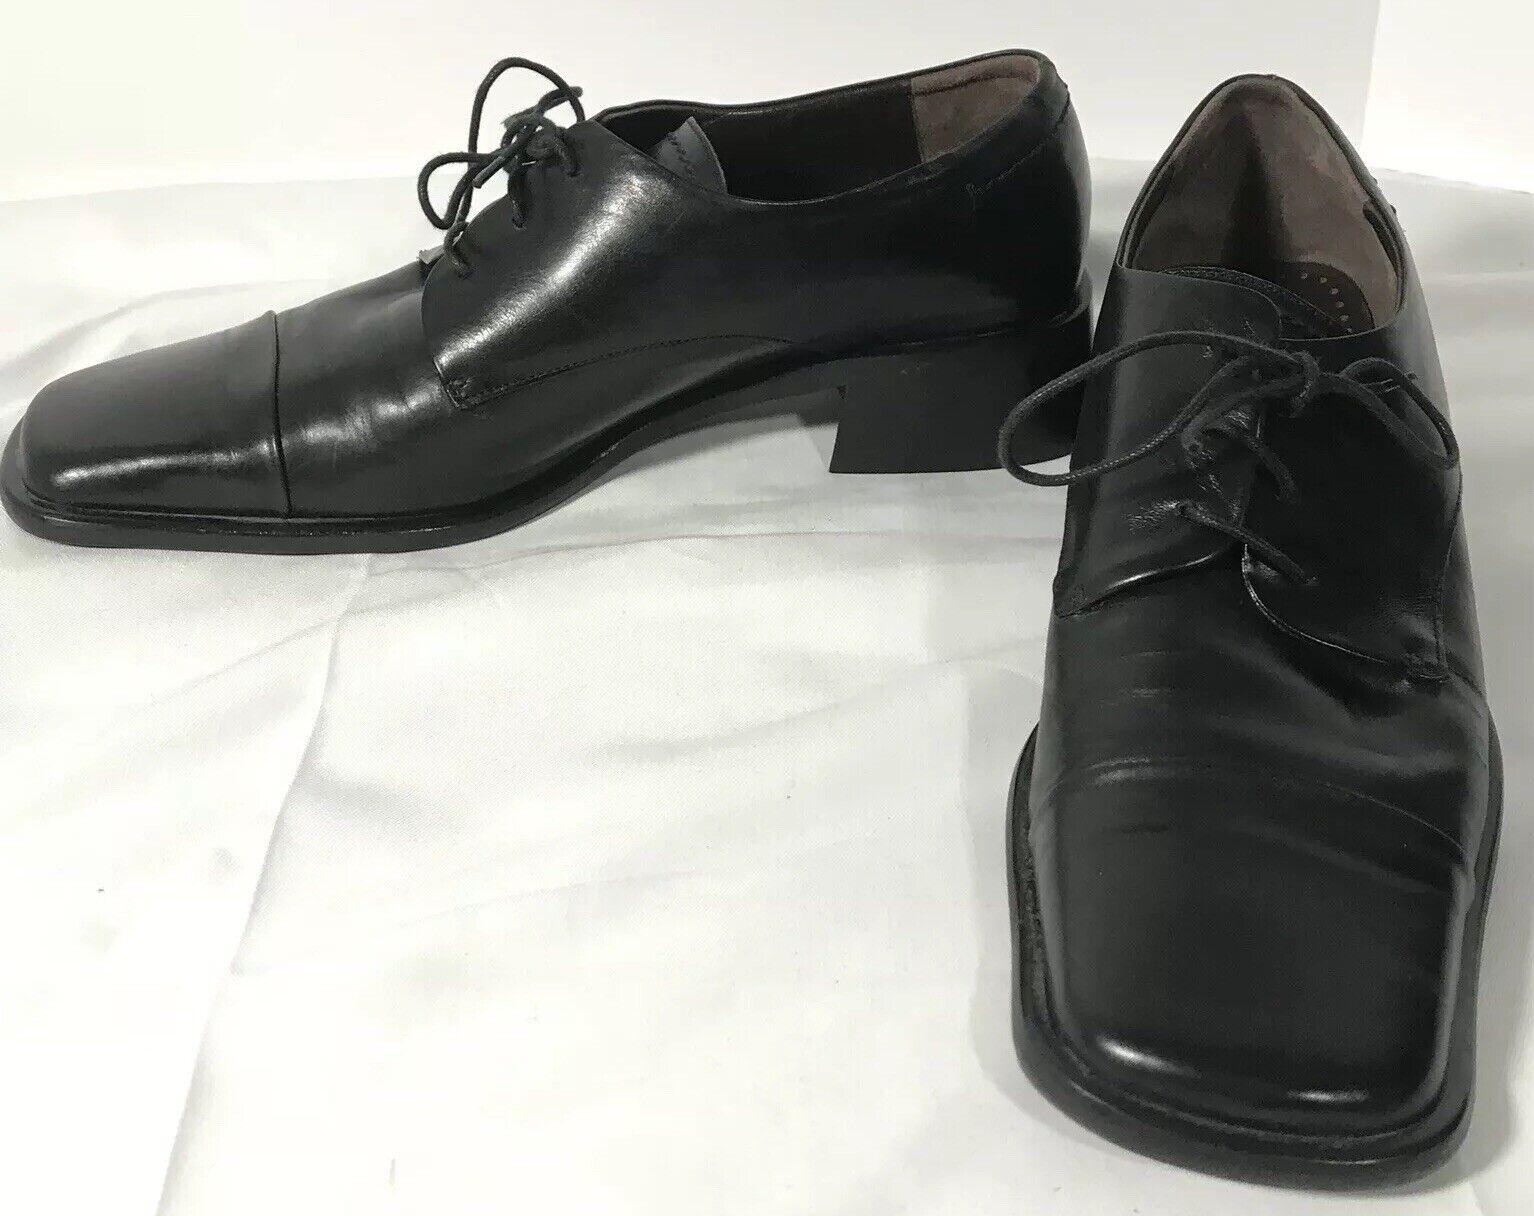 Kenneth Cole Square Cap Toe Leather Oxford Men's Size 7.5M Black Slim